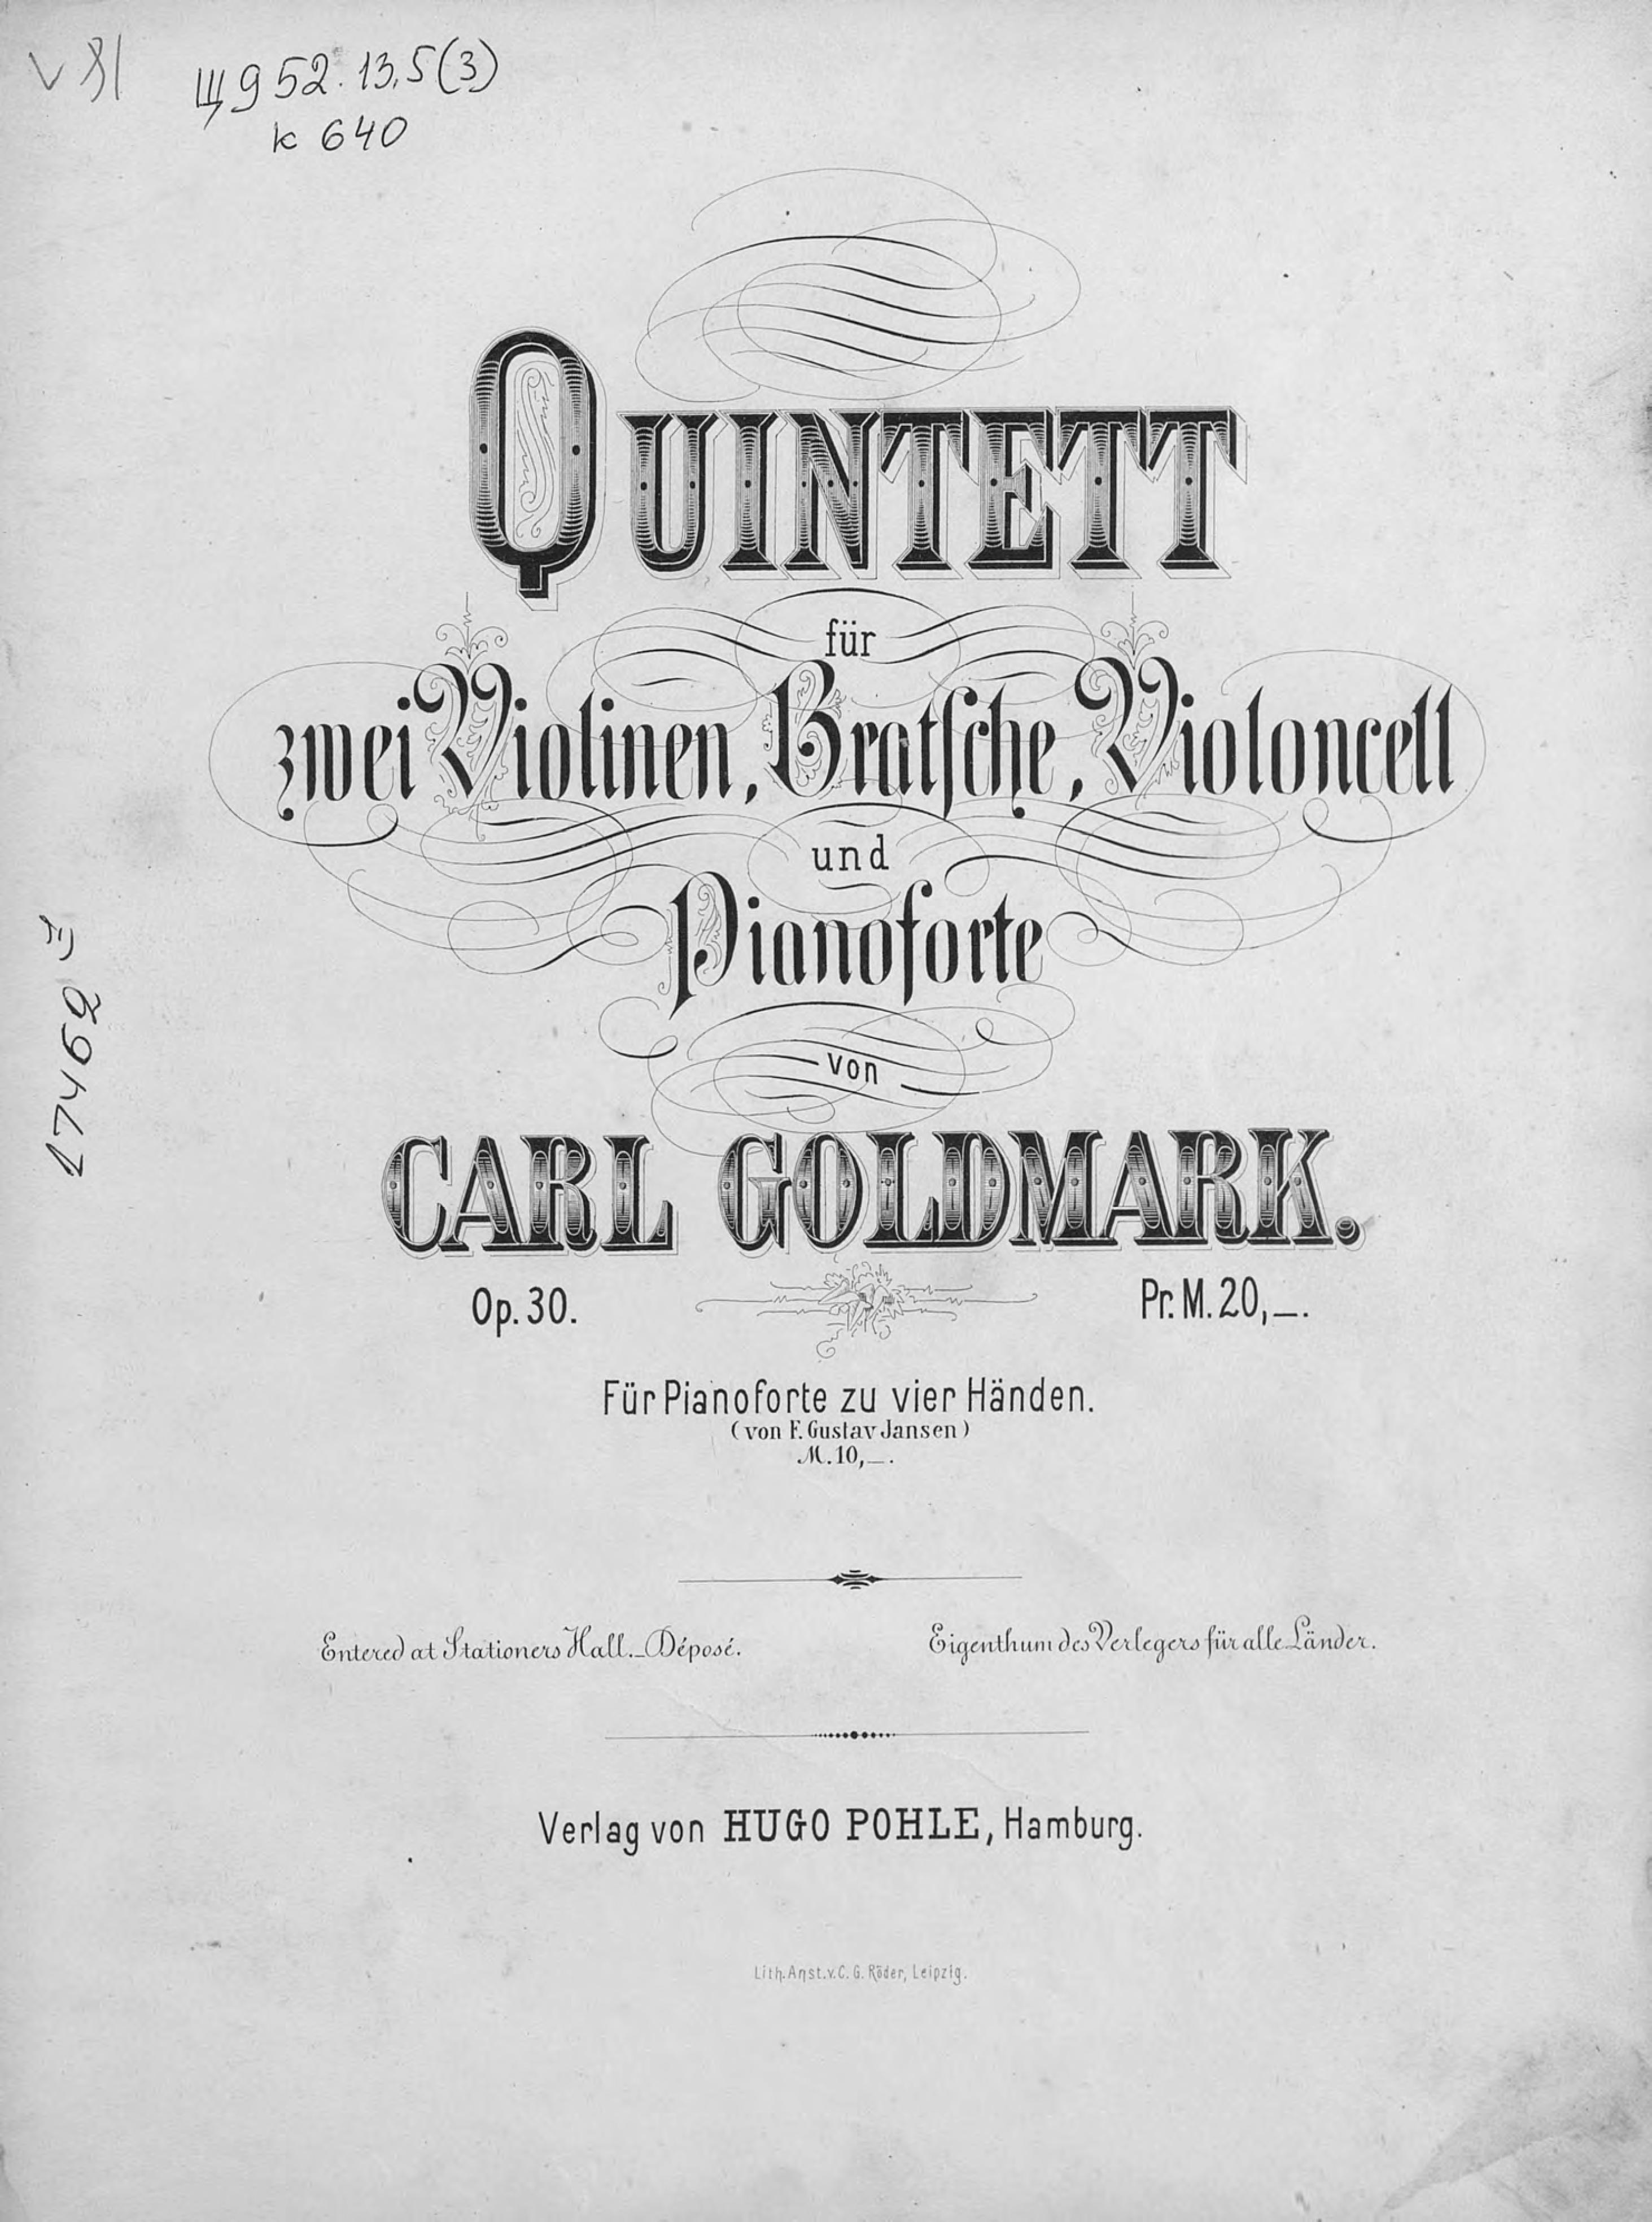 Quintett fur 2 Violinen, Bratsche, Violoncell und Pianoforte v. Carl Goldmark